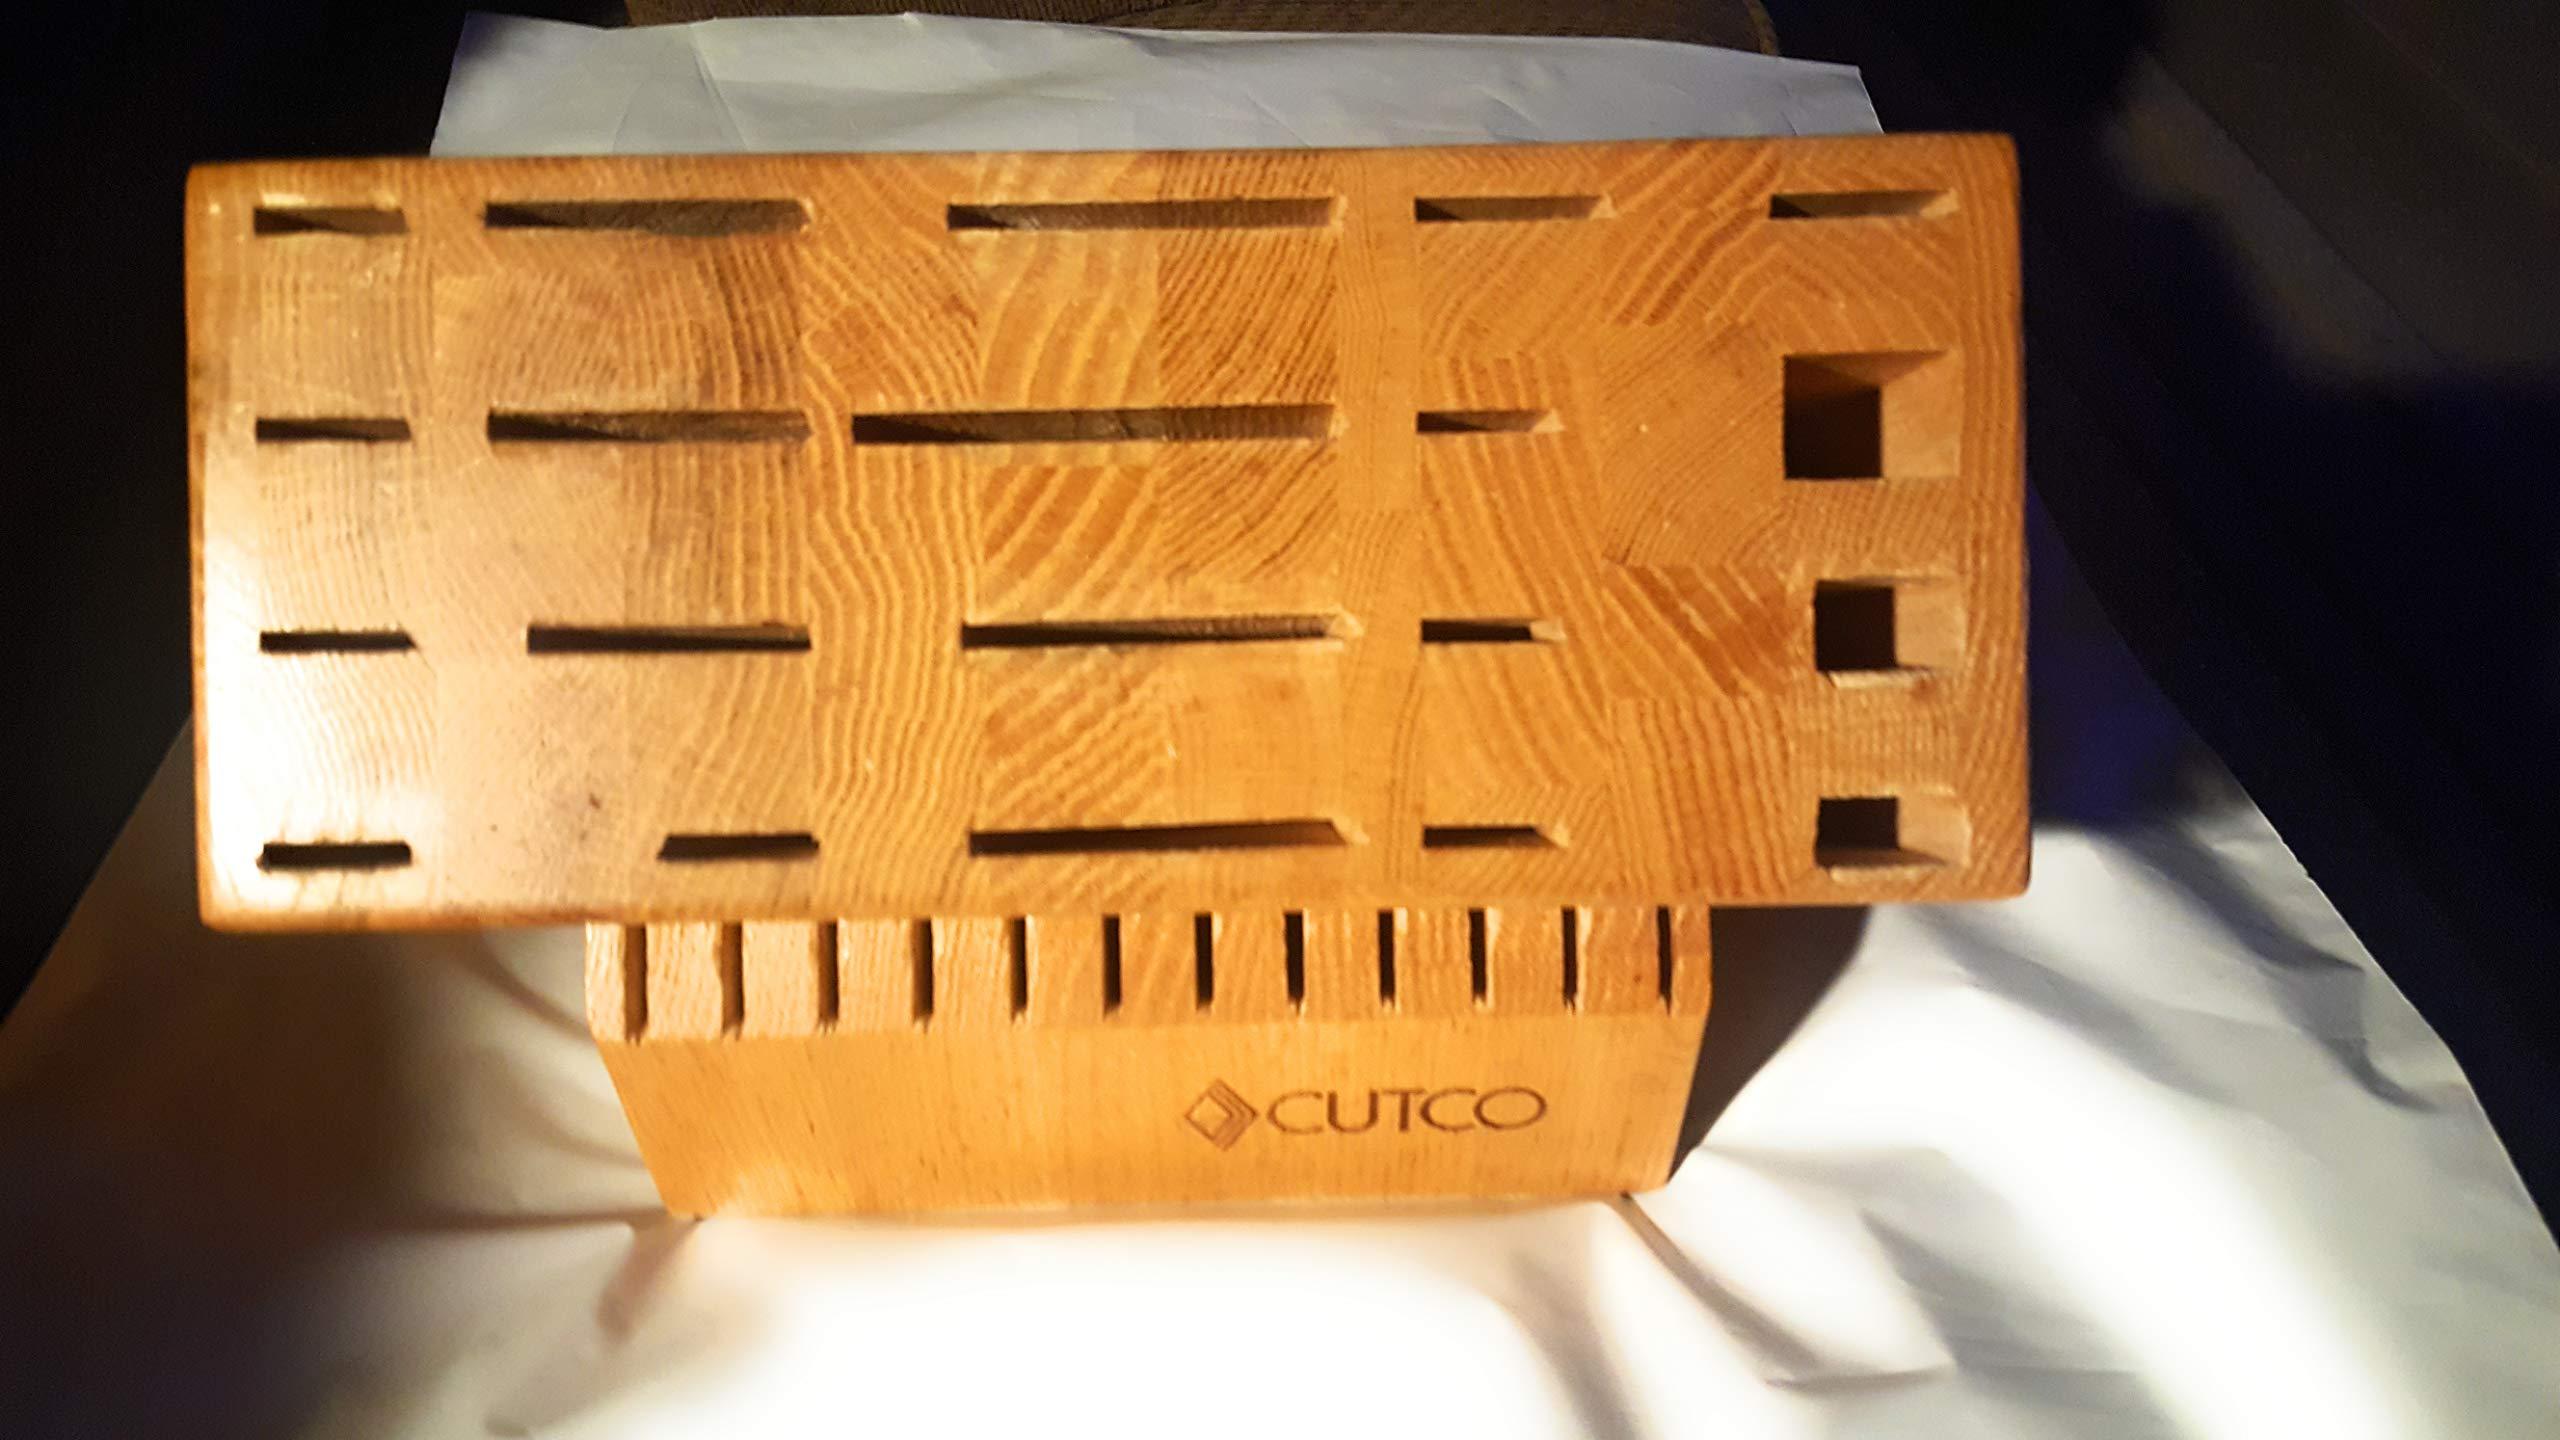 Cutco #1747 32-Slot Ultimate Set Block (Honey Finish)